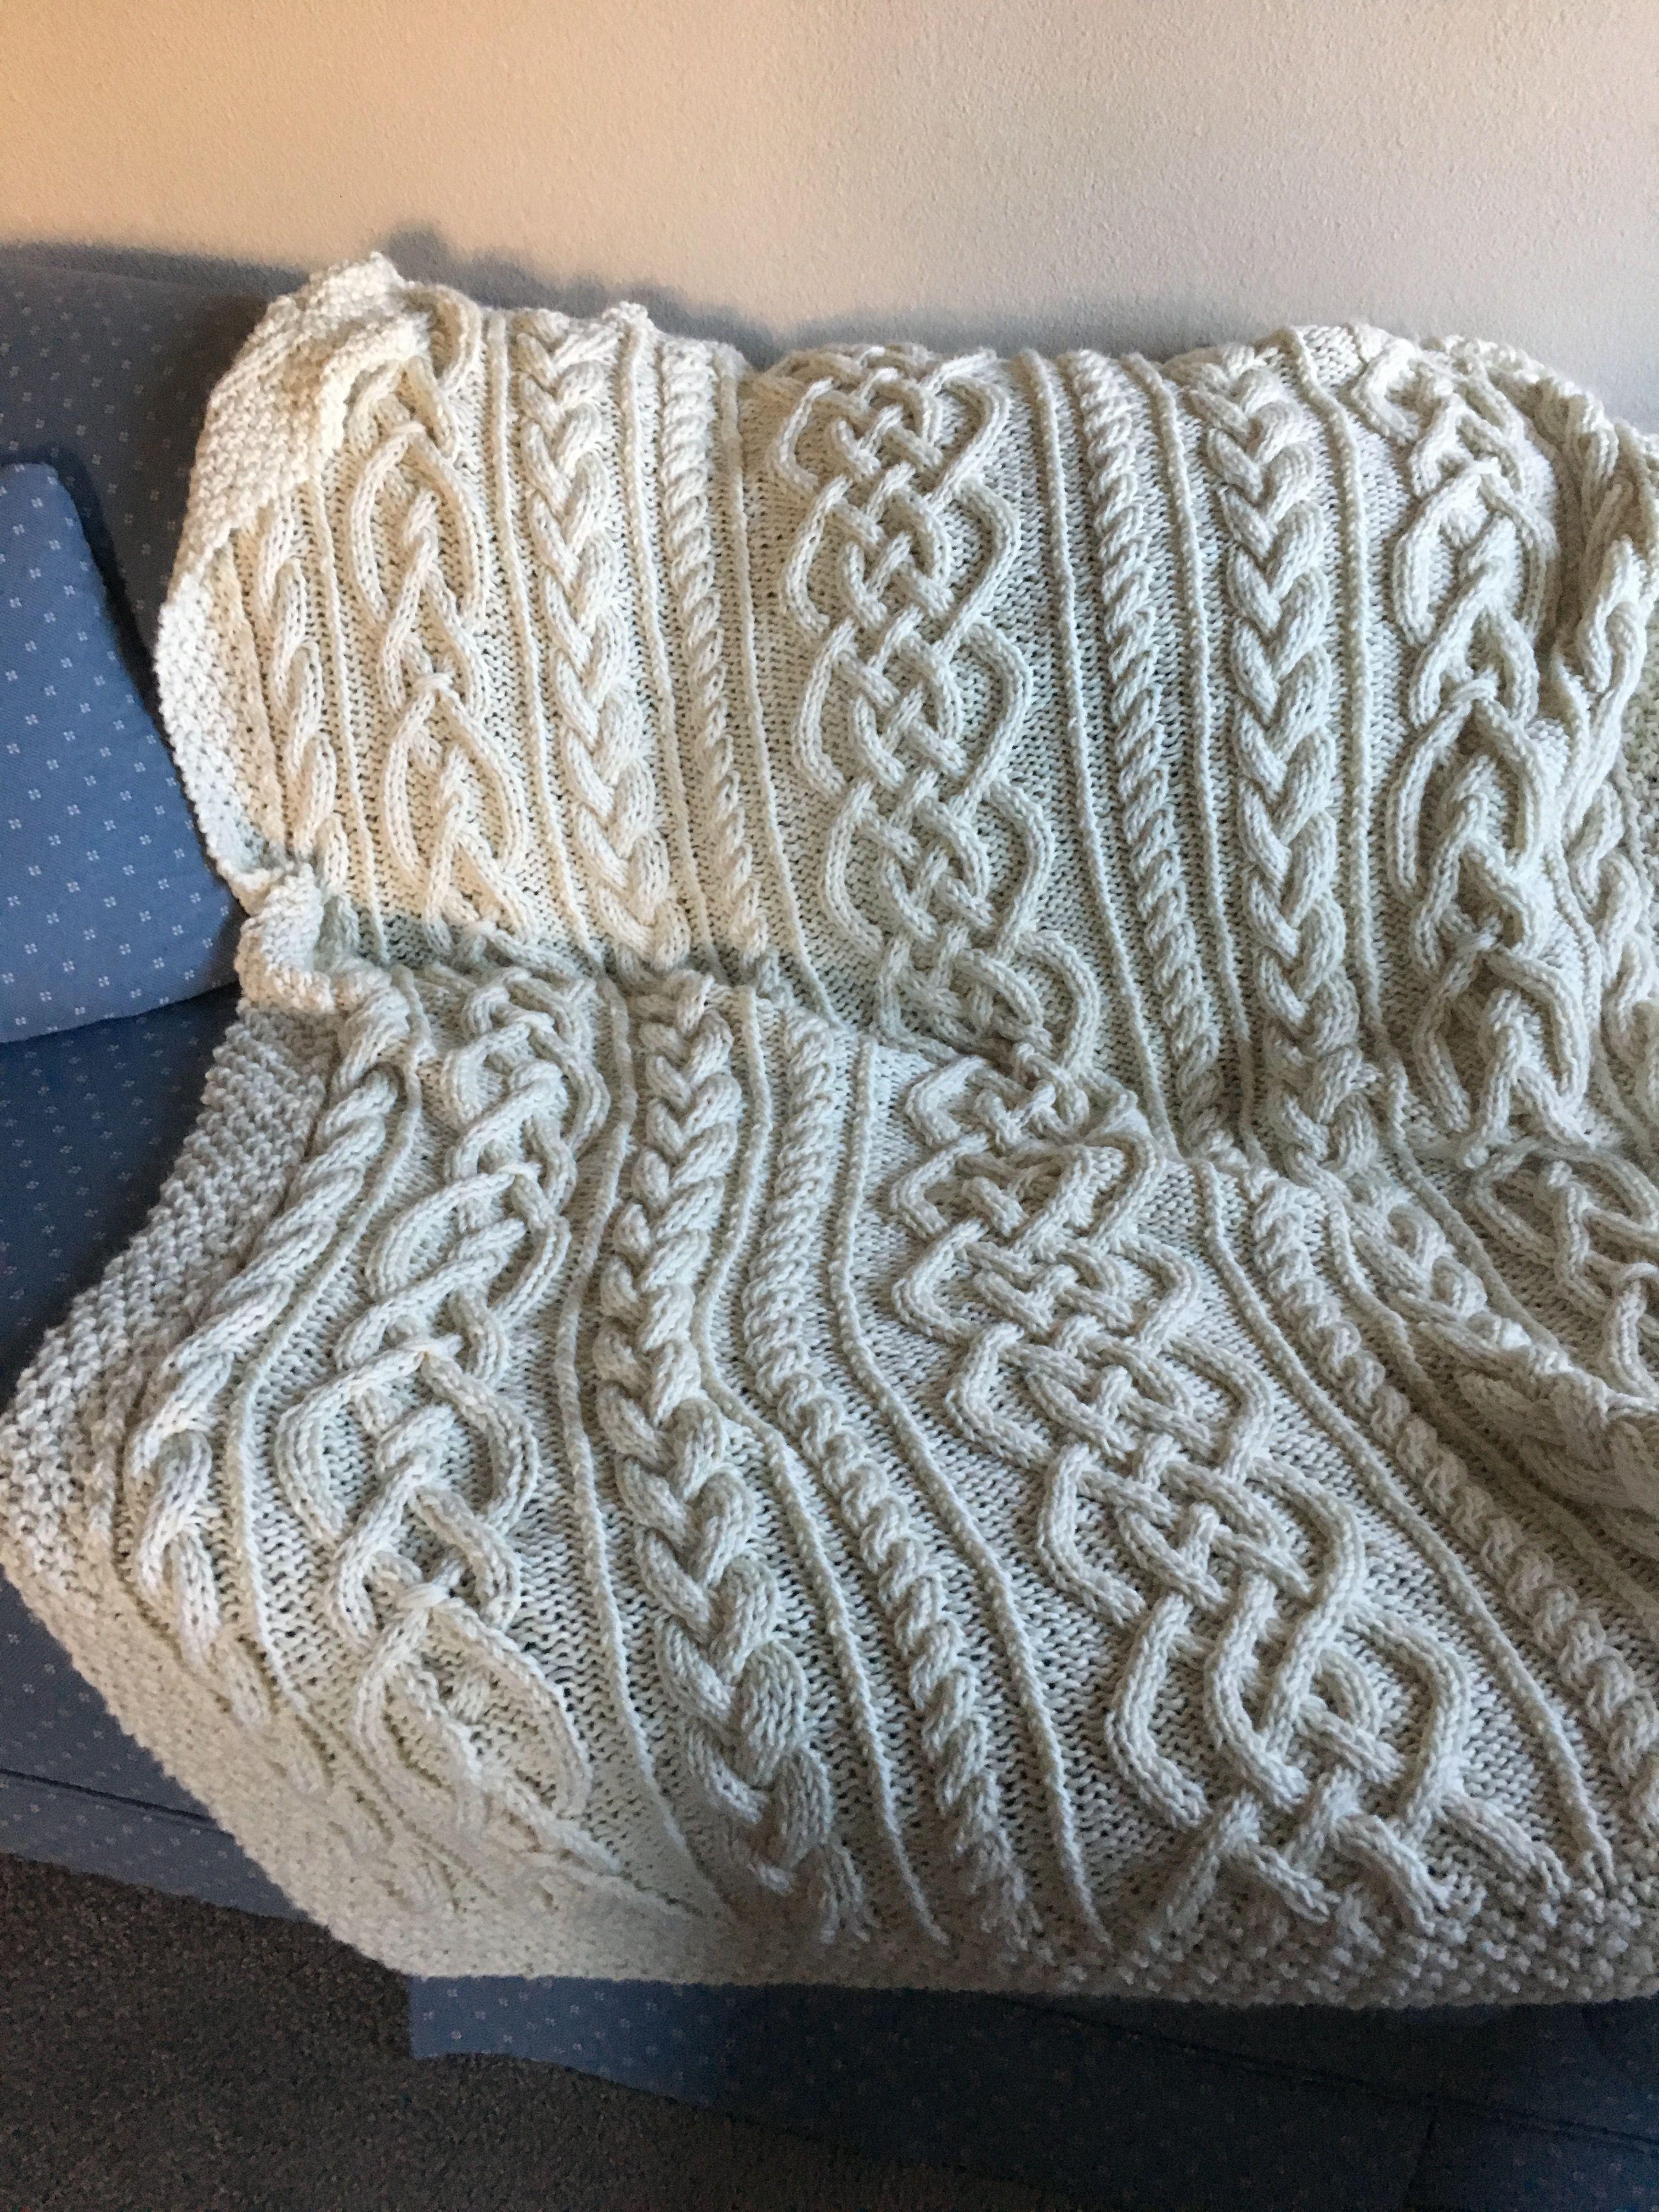 Pin by Марианна on Вязание | Pinterest | Knit crochet, Afghans and ...